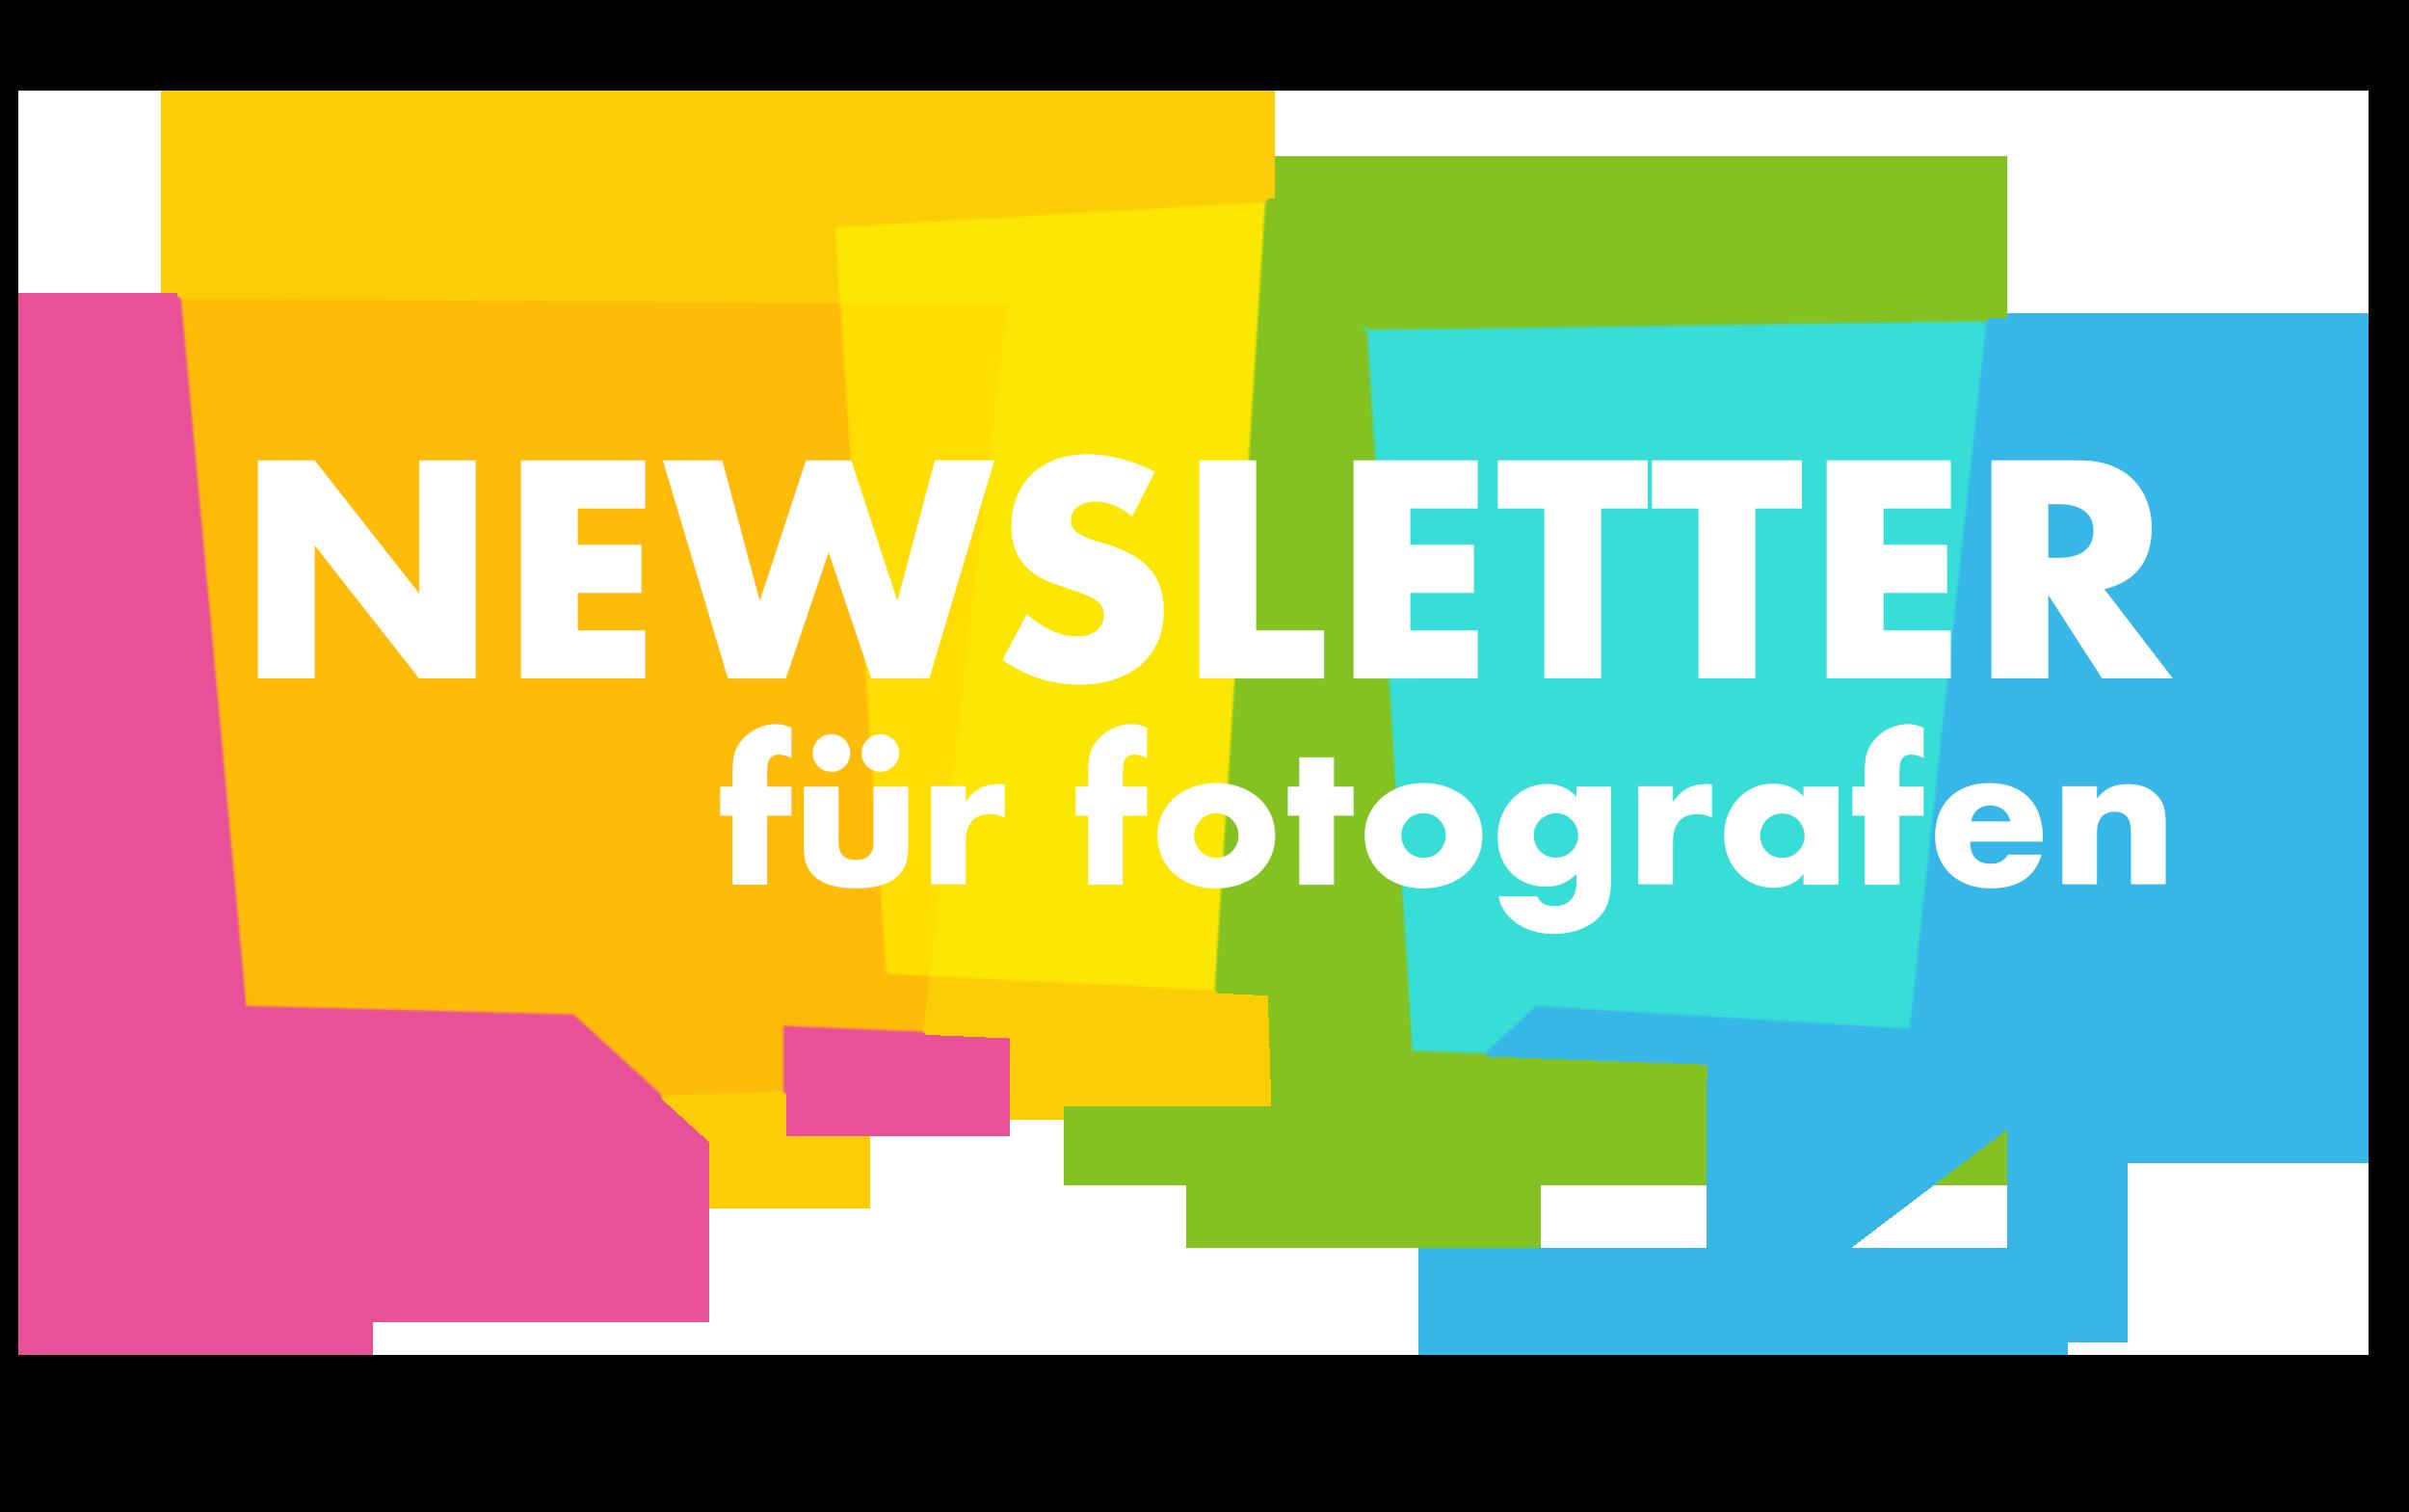 Peter_Michels_Seminar_Newsletter_photo19_1.png